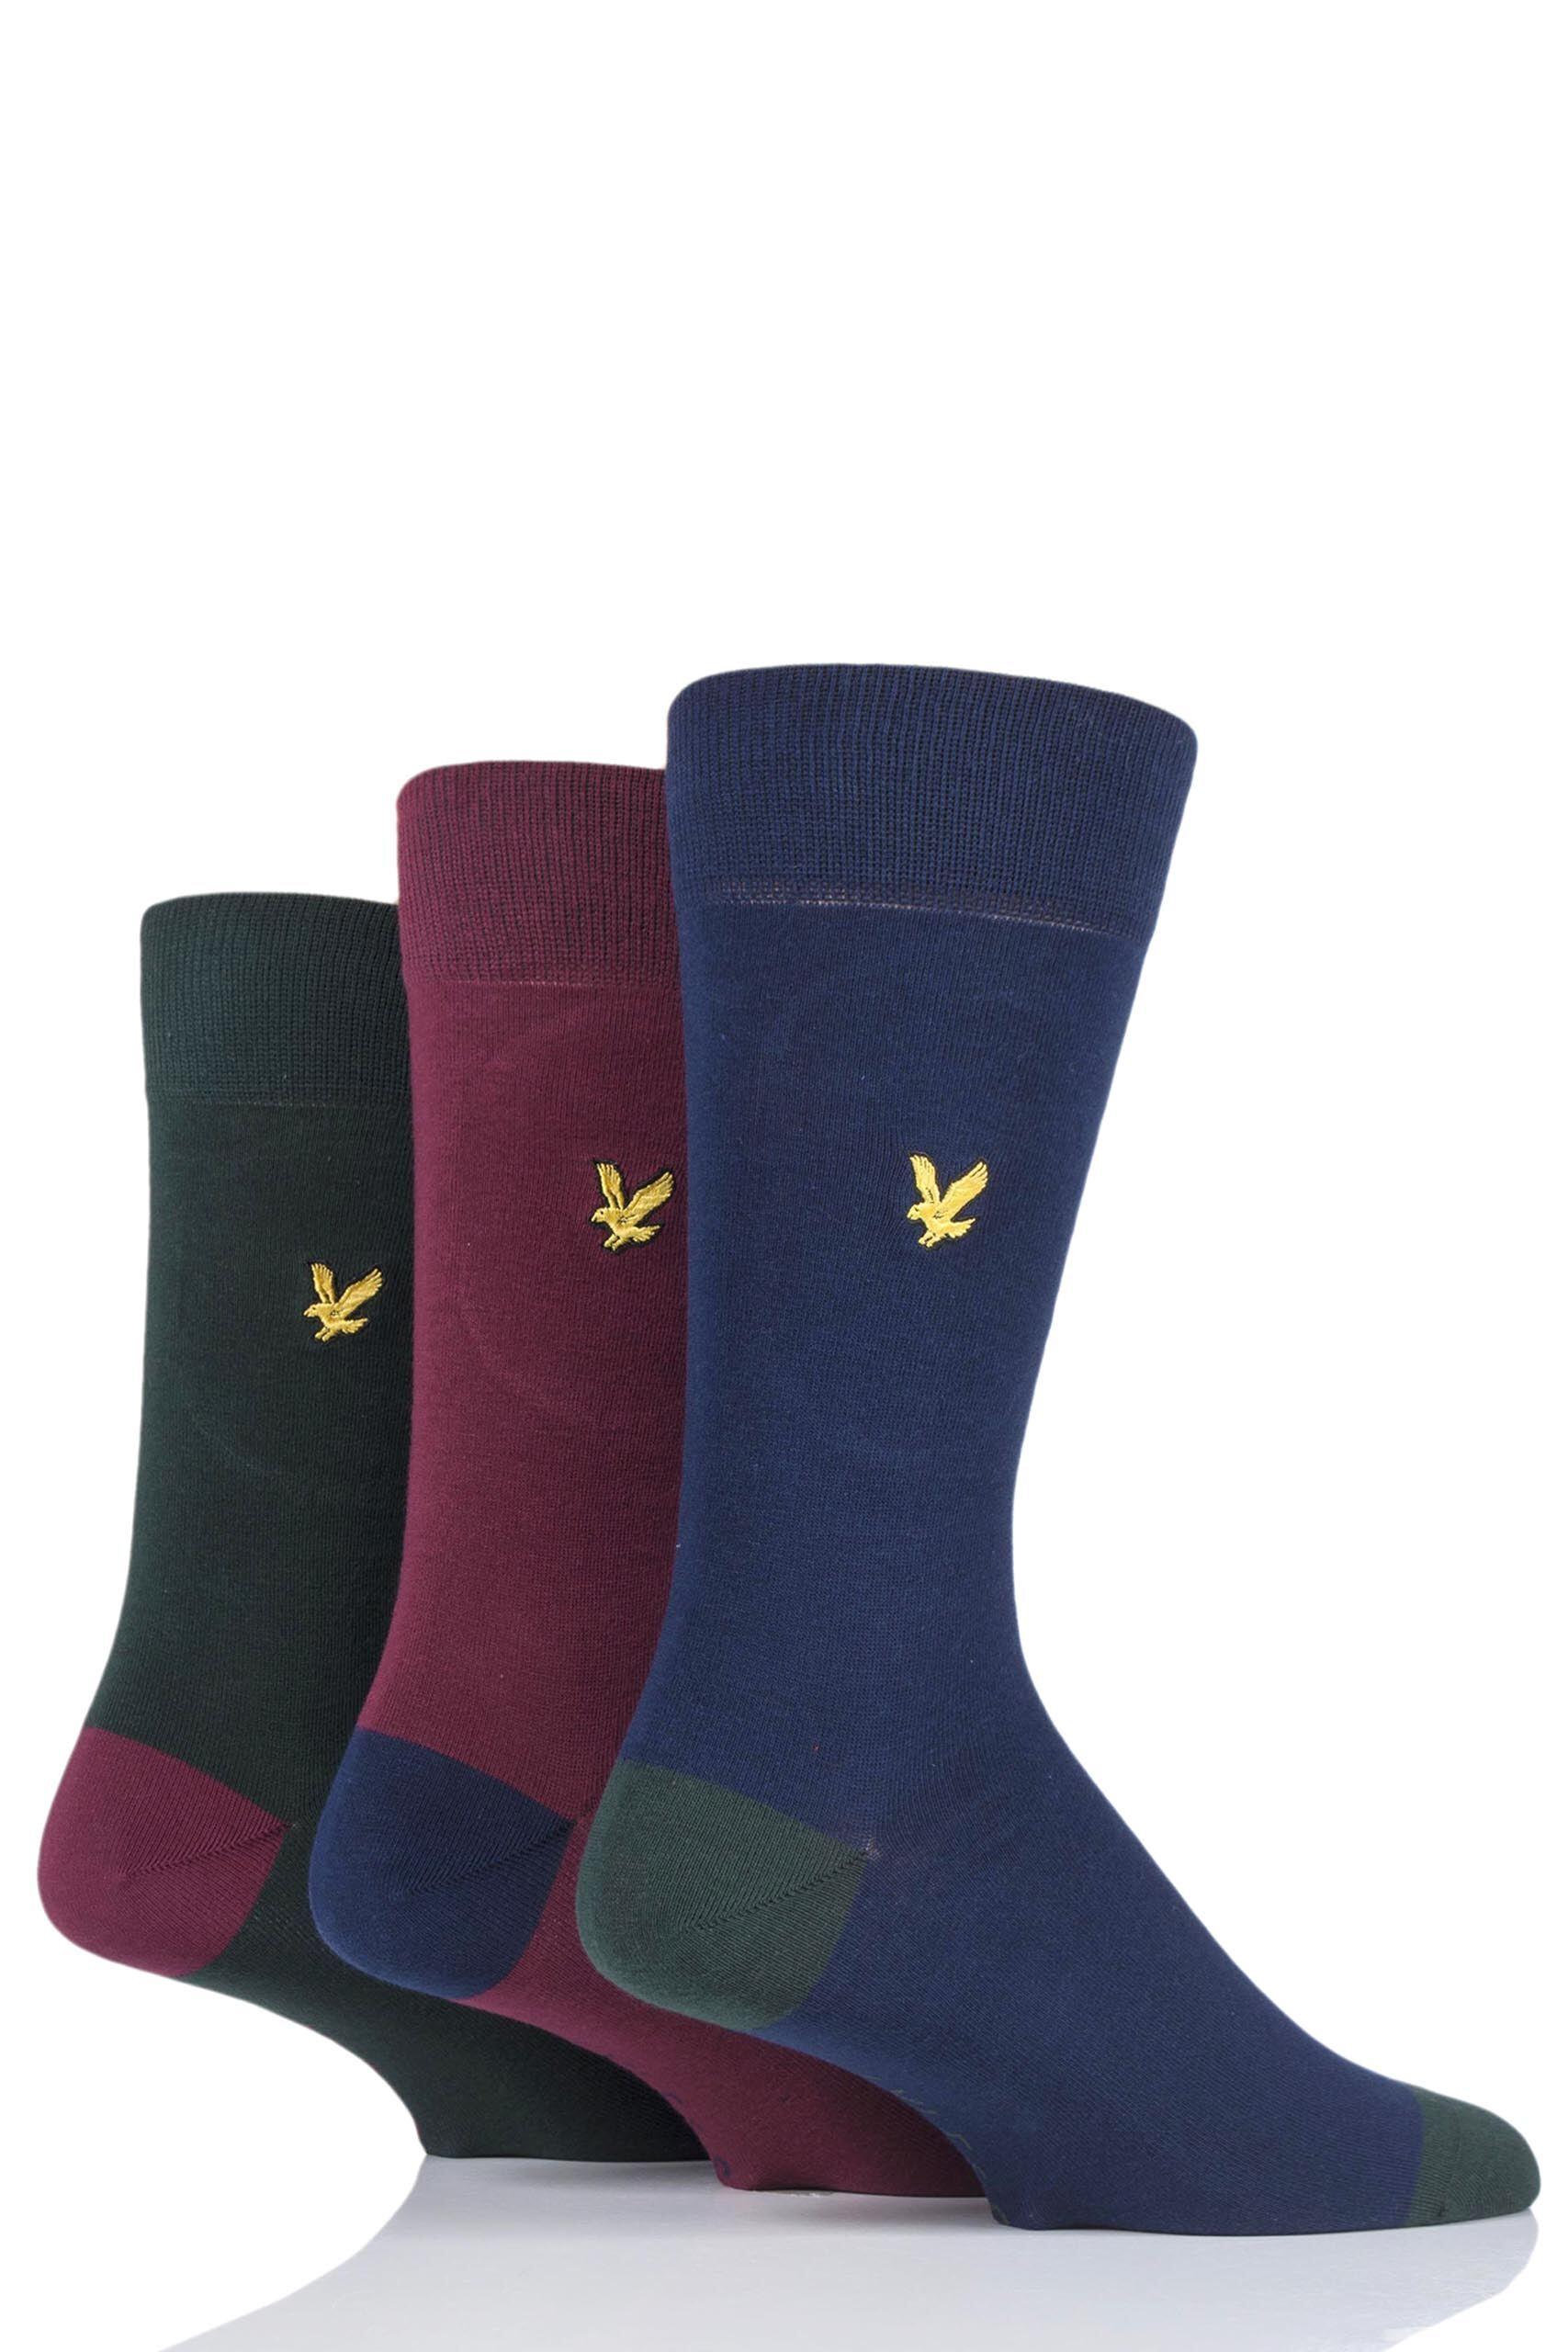 Image of 3 Pair Pine Kennedy Contrast Heel and Toe Cotton Socks Men's 7-11 Mens - Lyle & Scott